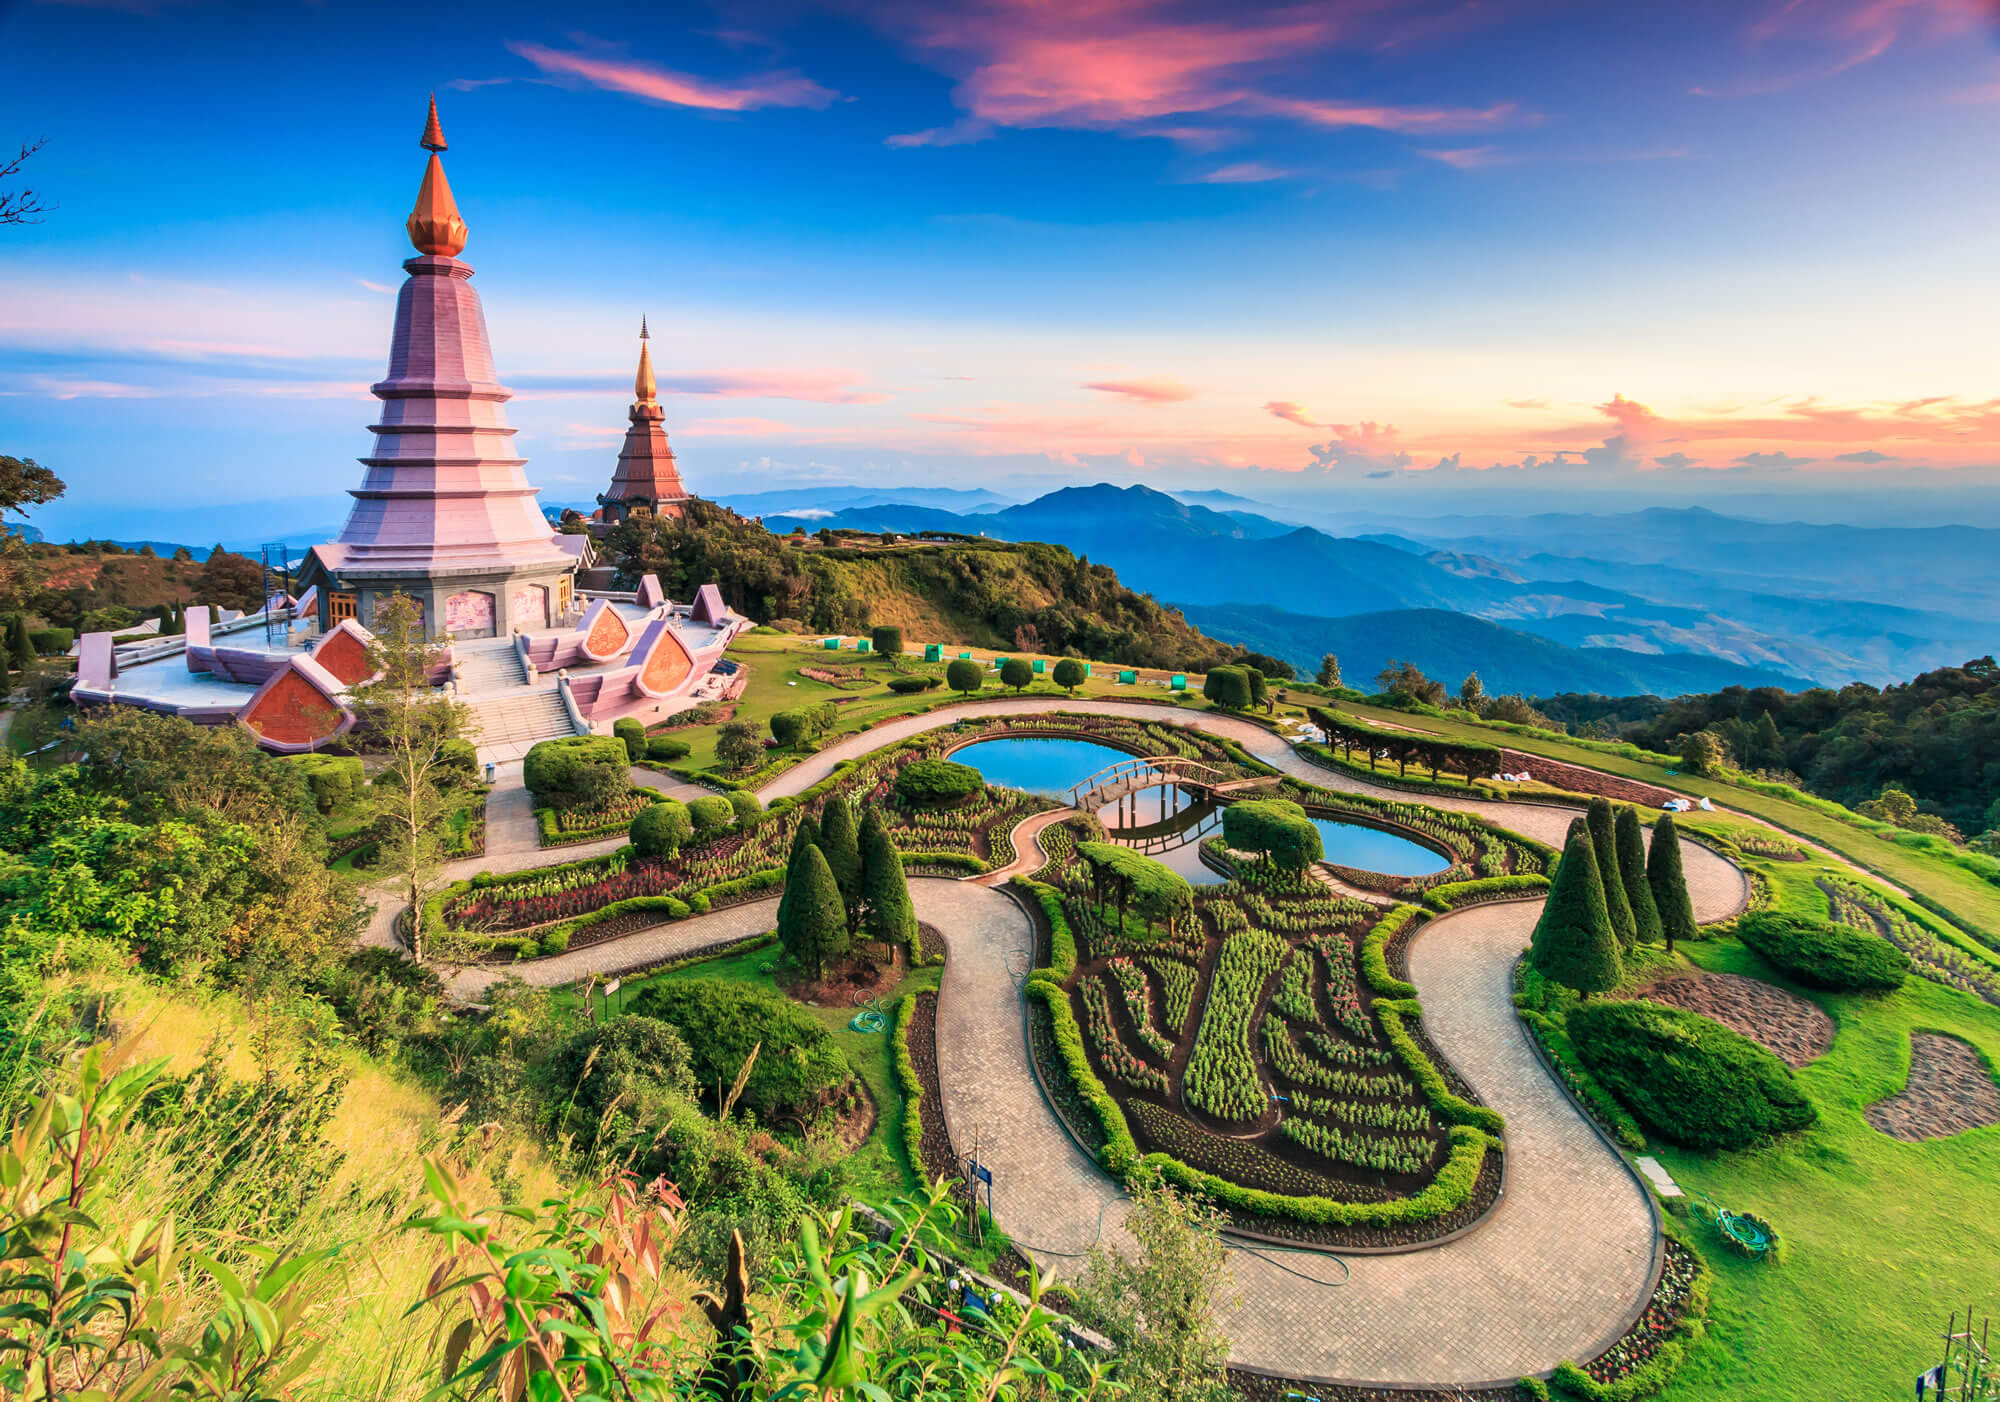 Inthanon national park, Thailand